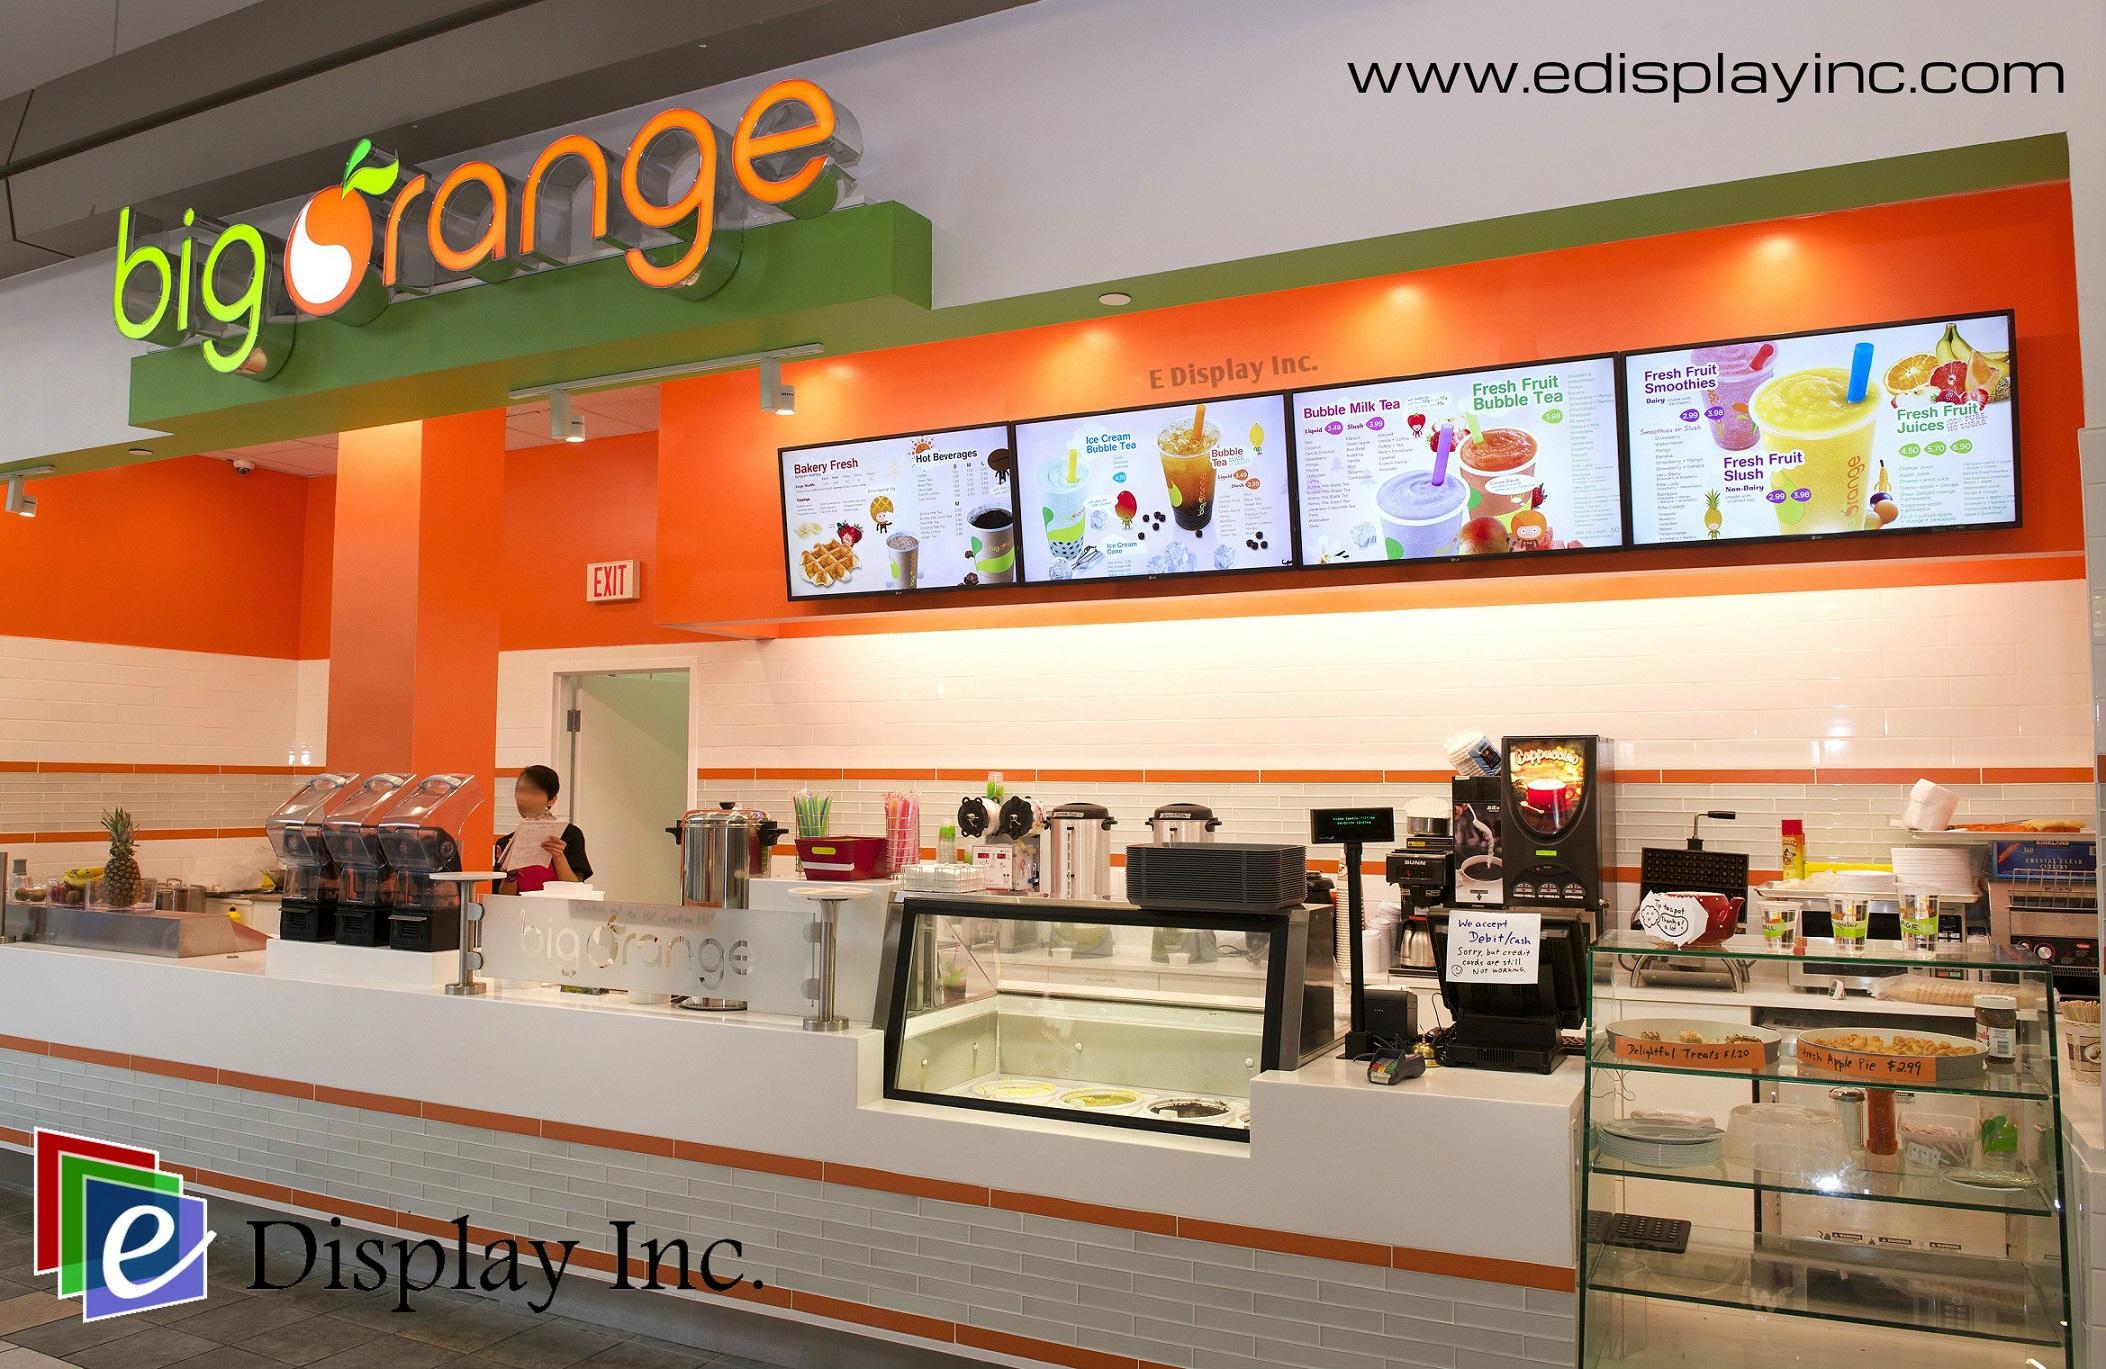 E Display Digital Menu Boards for Big Orange.